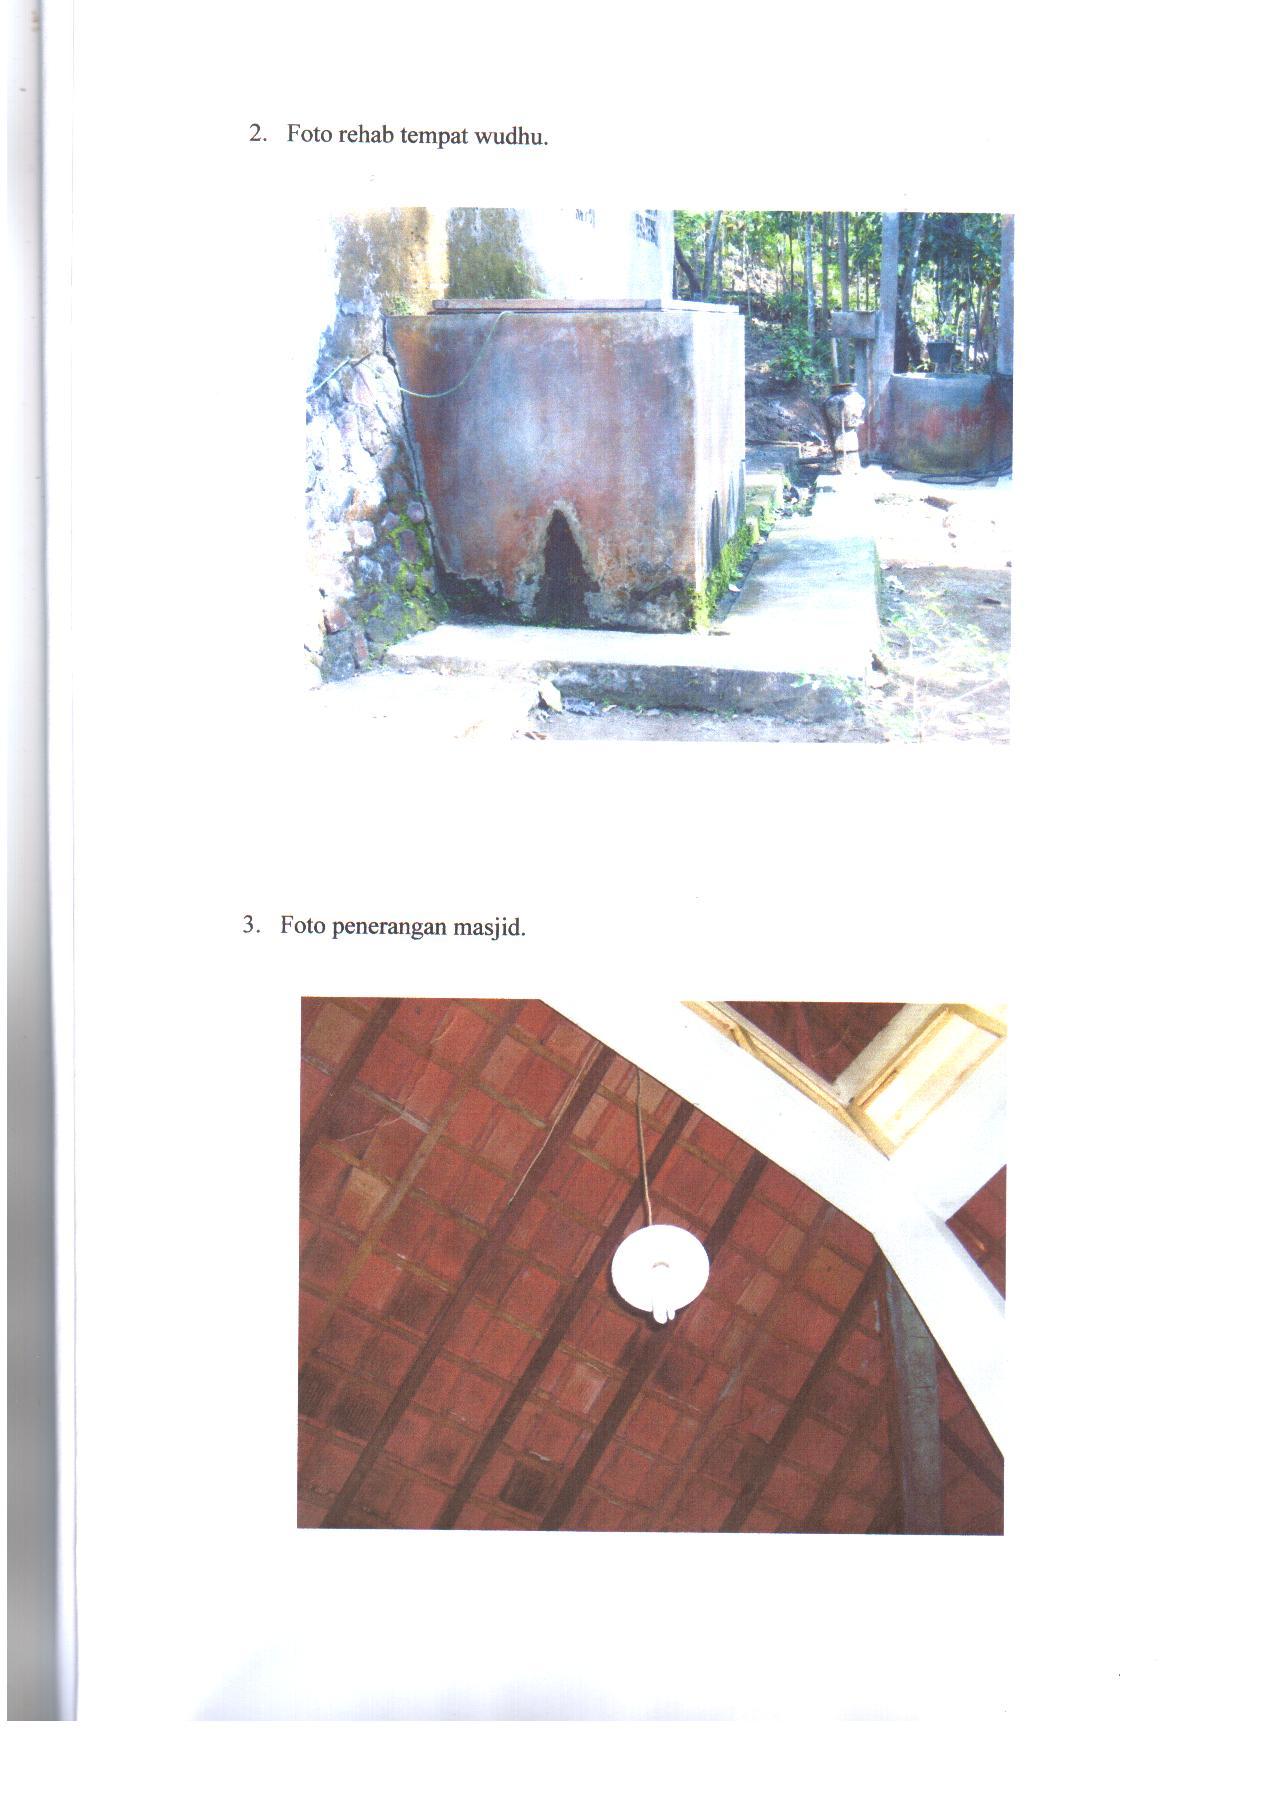 Foto Tempat Wudlu dan Penerangan Masjid Lukman Khakim